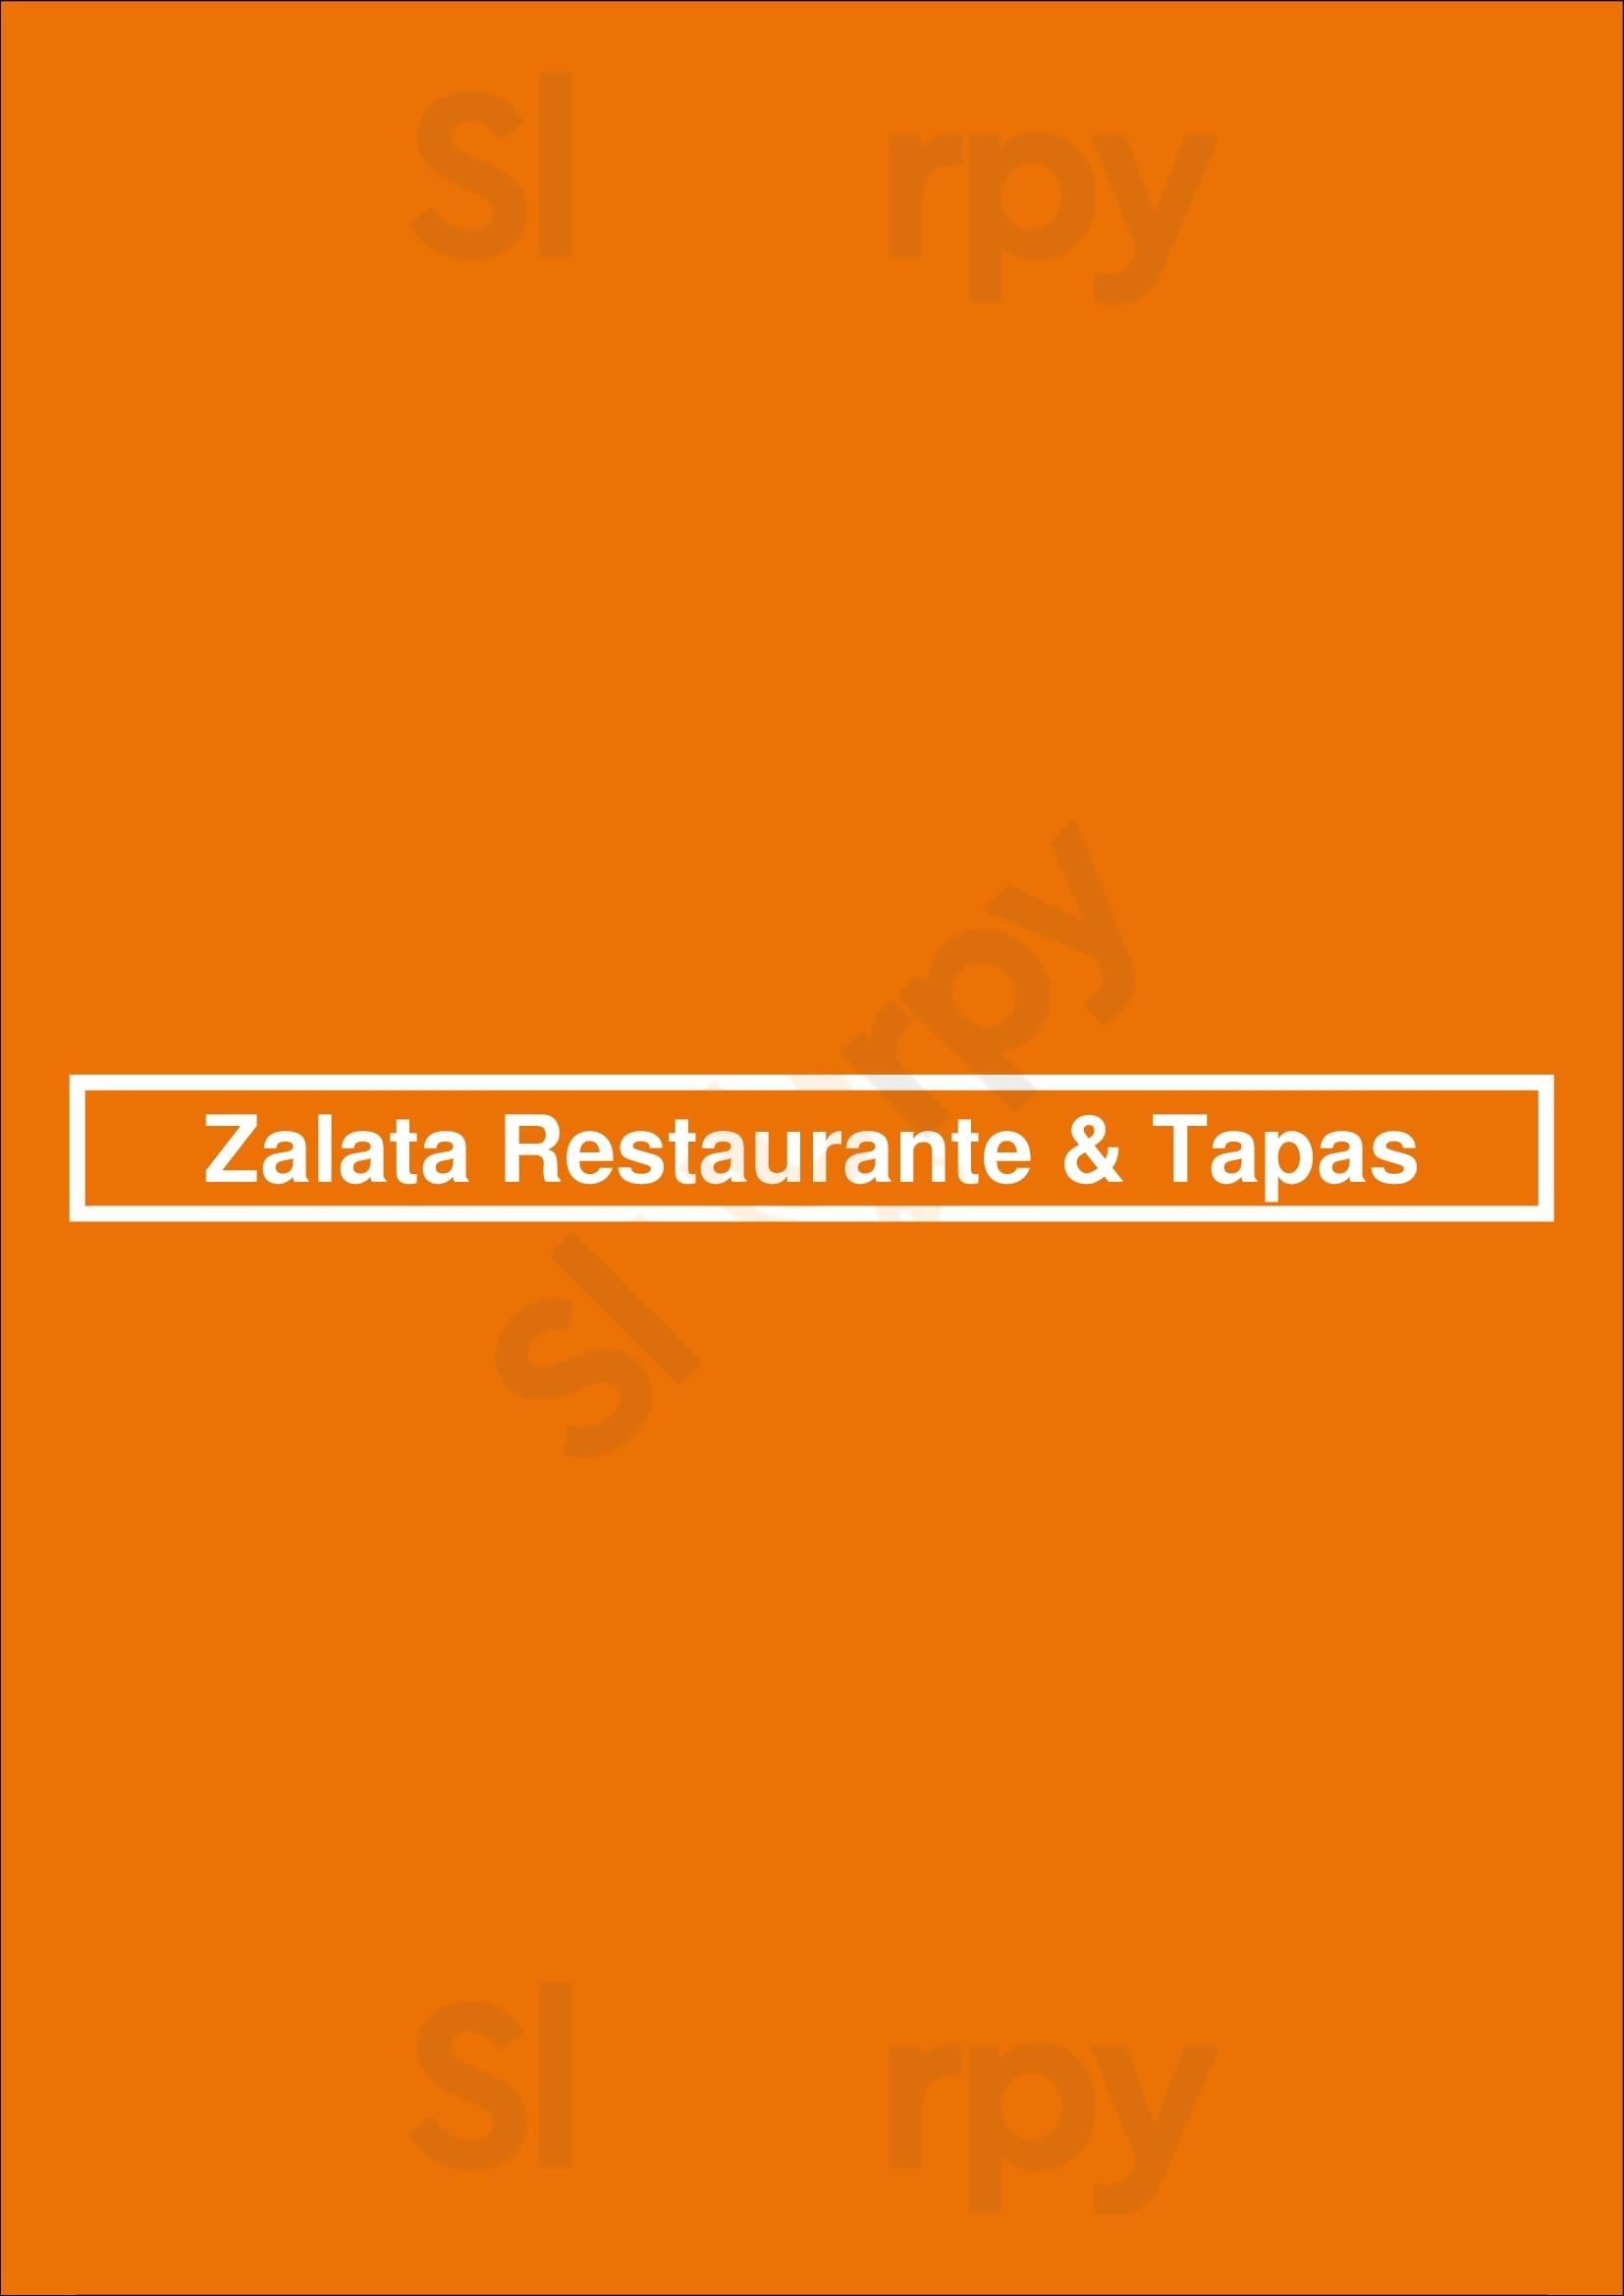 Zalata Restaurante & Tapas Sevilla menù - pagina 1